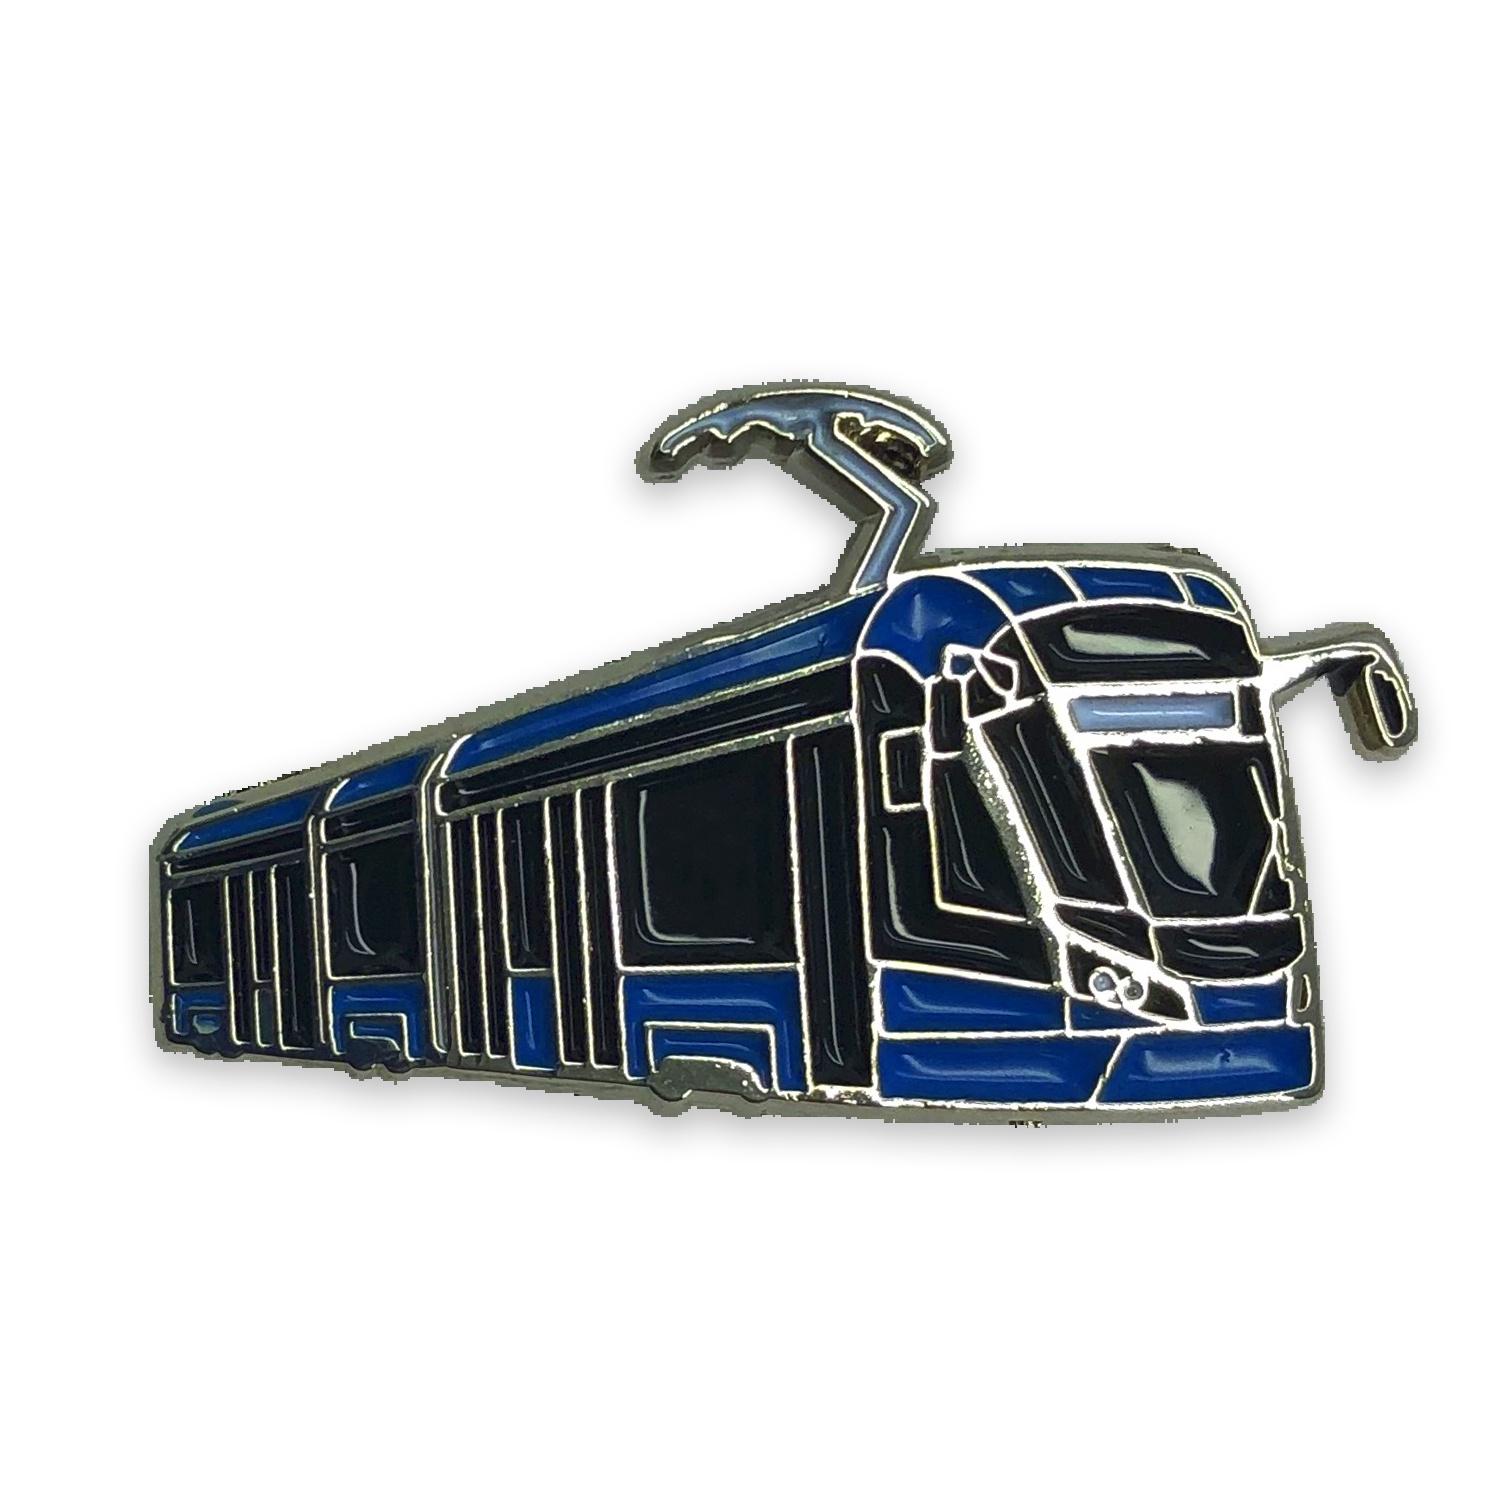 Moscow Metro Значок Трамвай Витязь-М значок